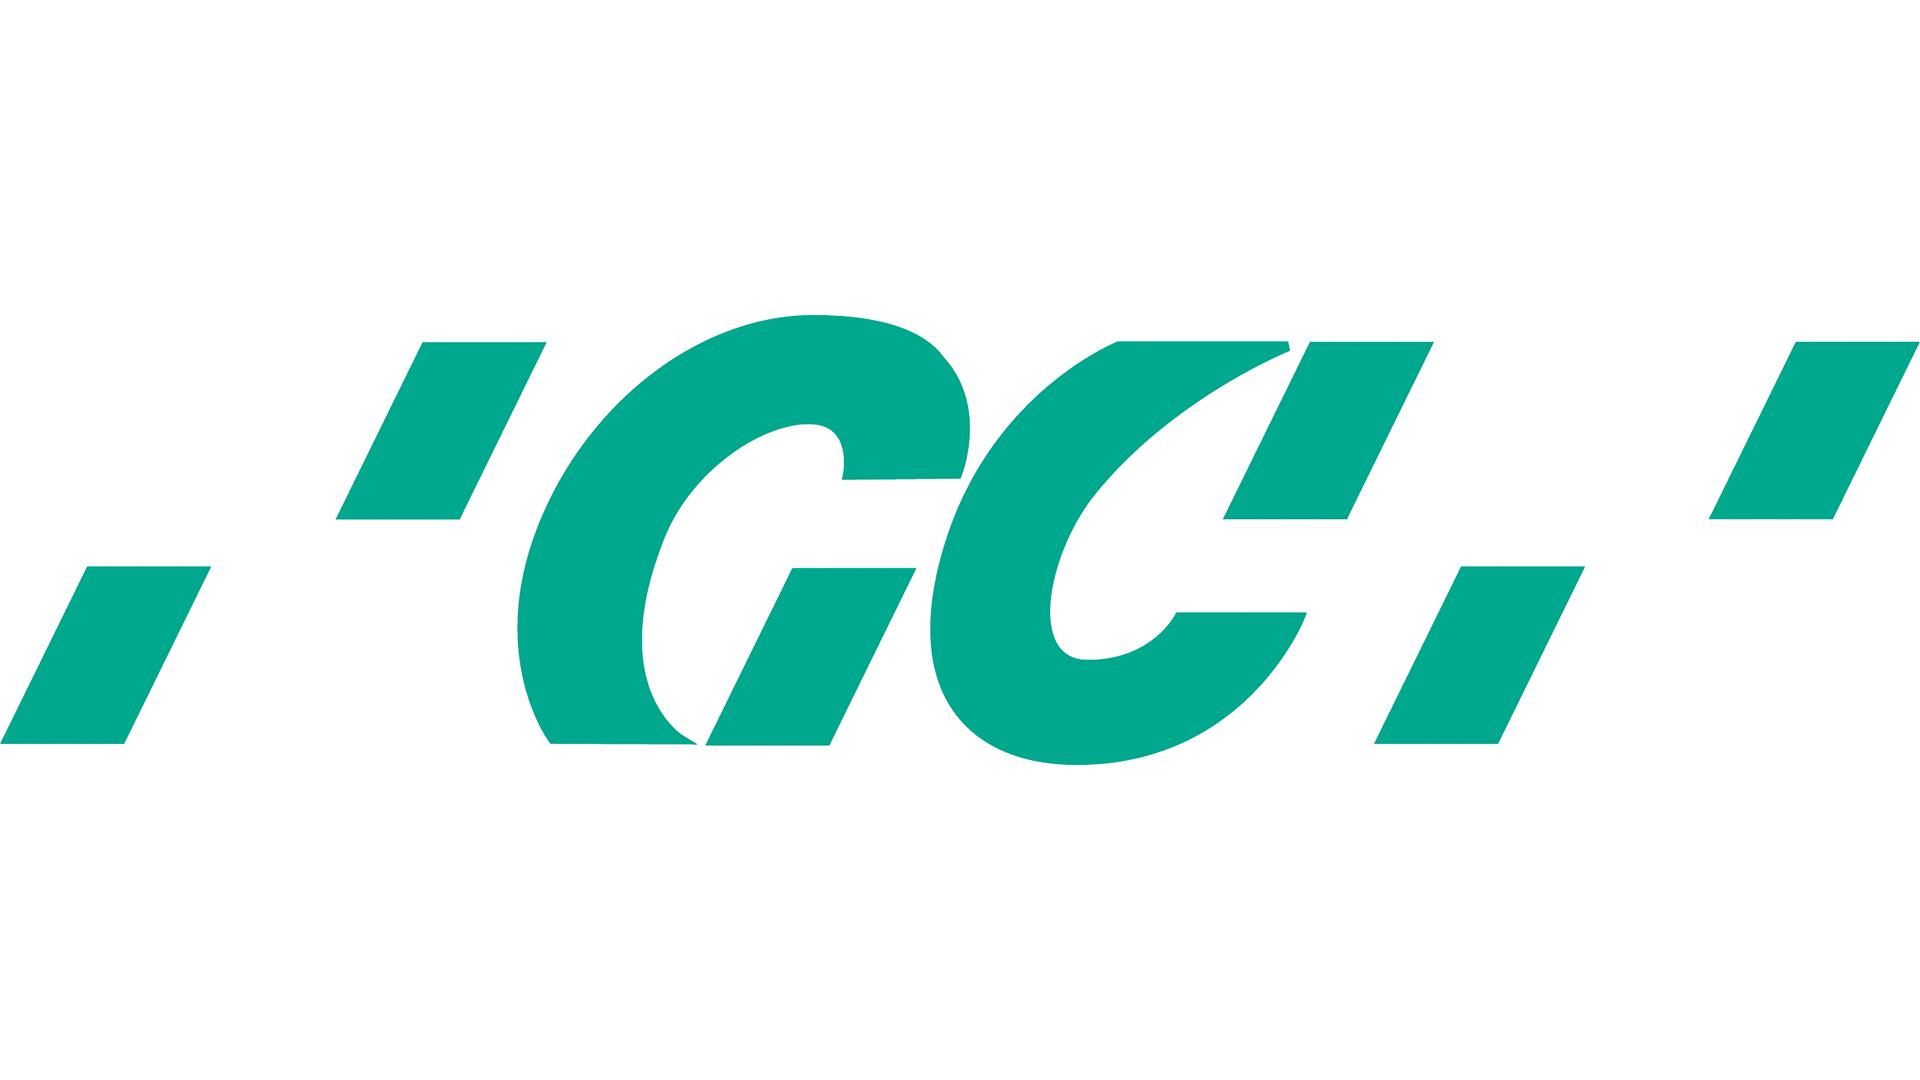 GC - 2020 Scientific Conference Programme